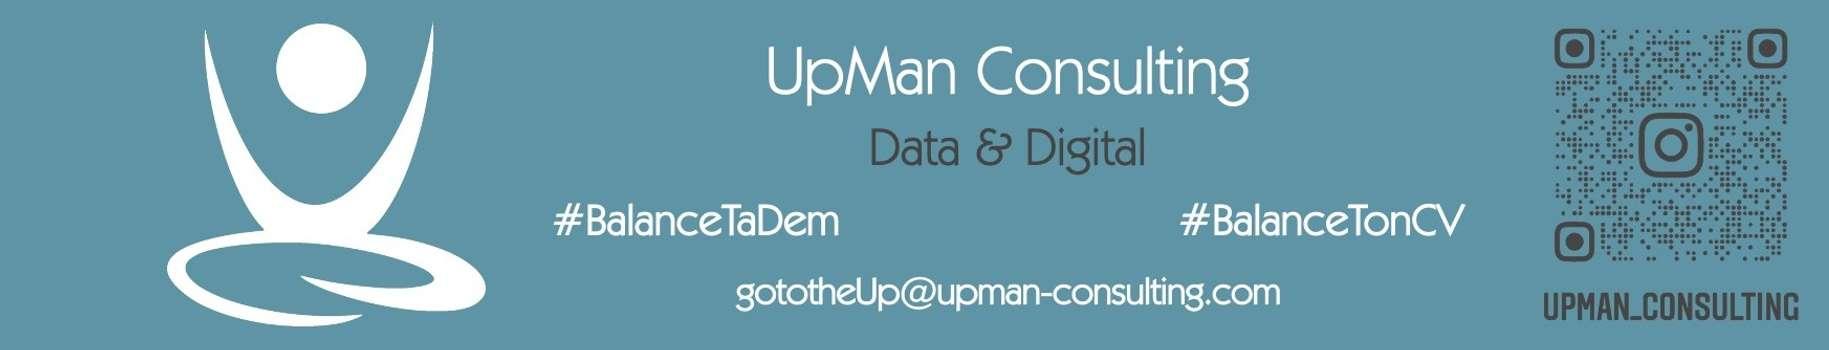 UpMan Consulting